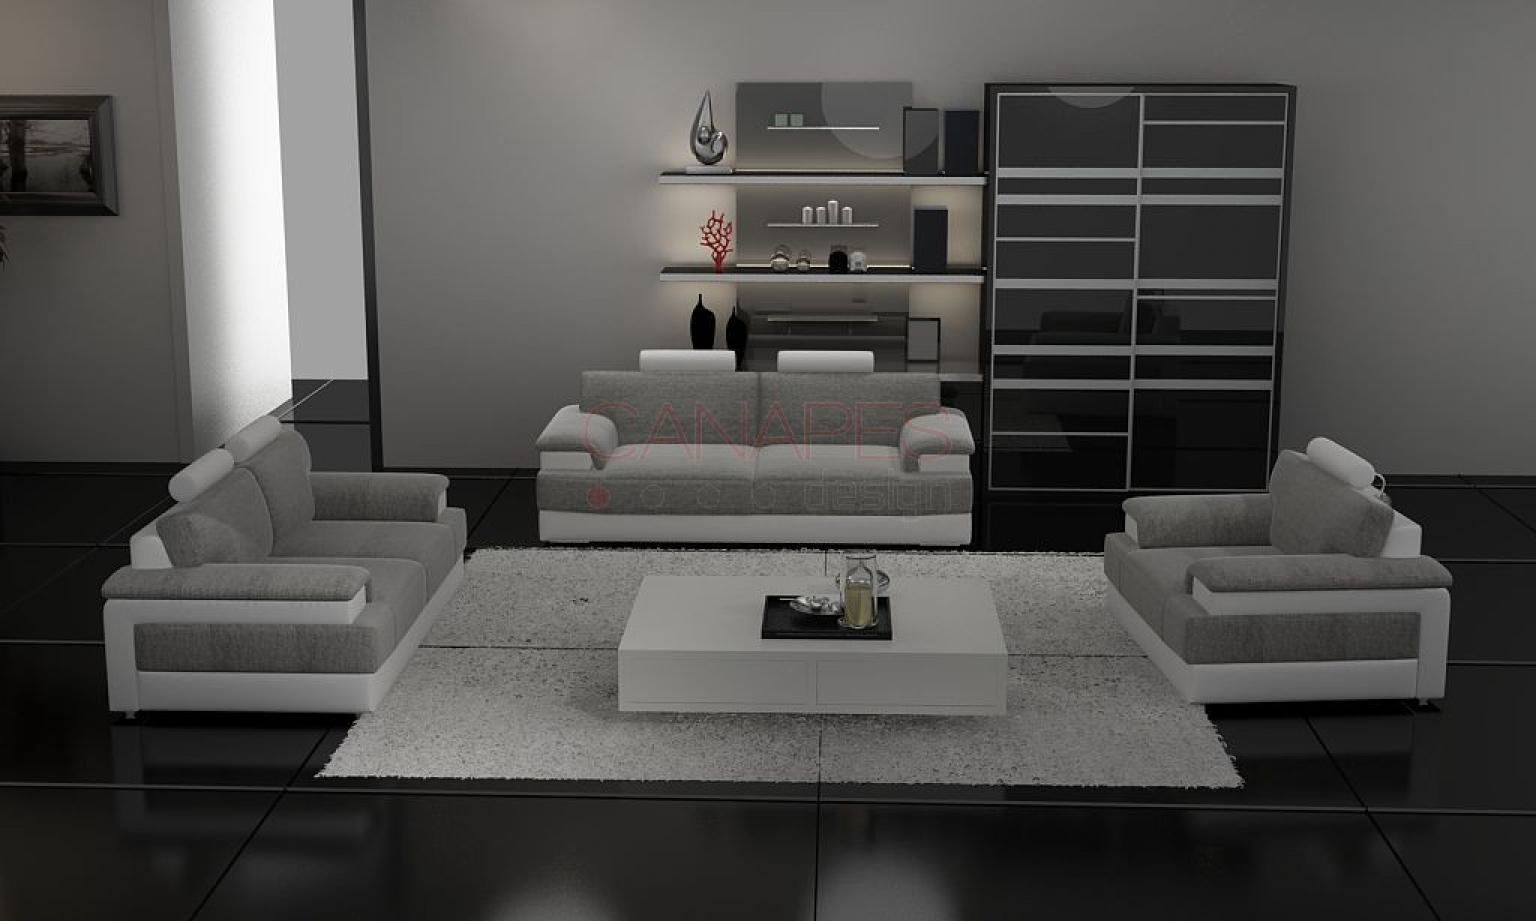 photos canap 3 2 1. Black Bedroom Furniture Sets. Home Design Ideas